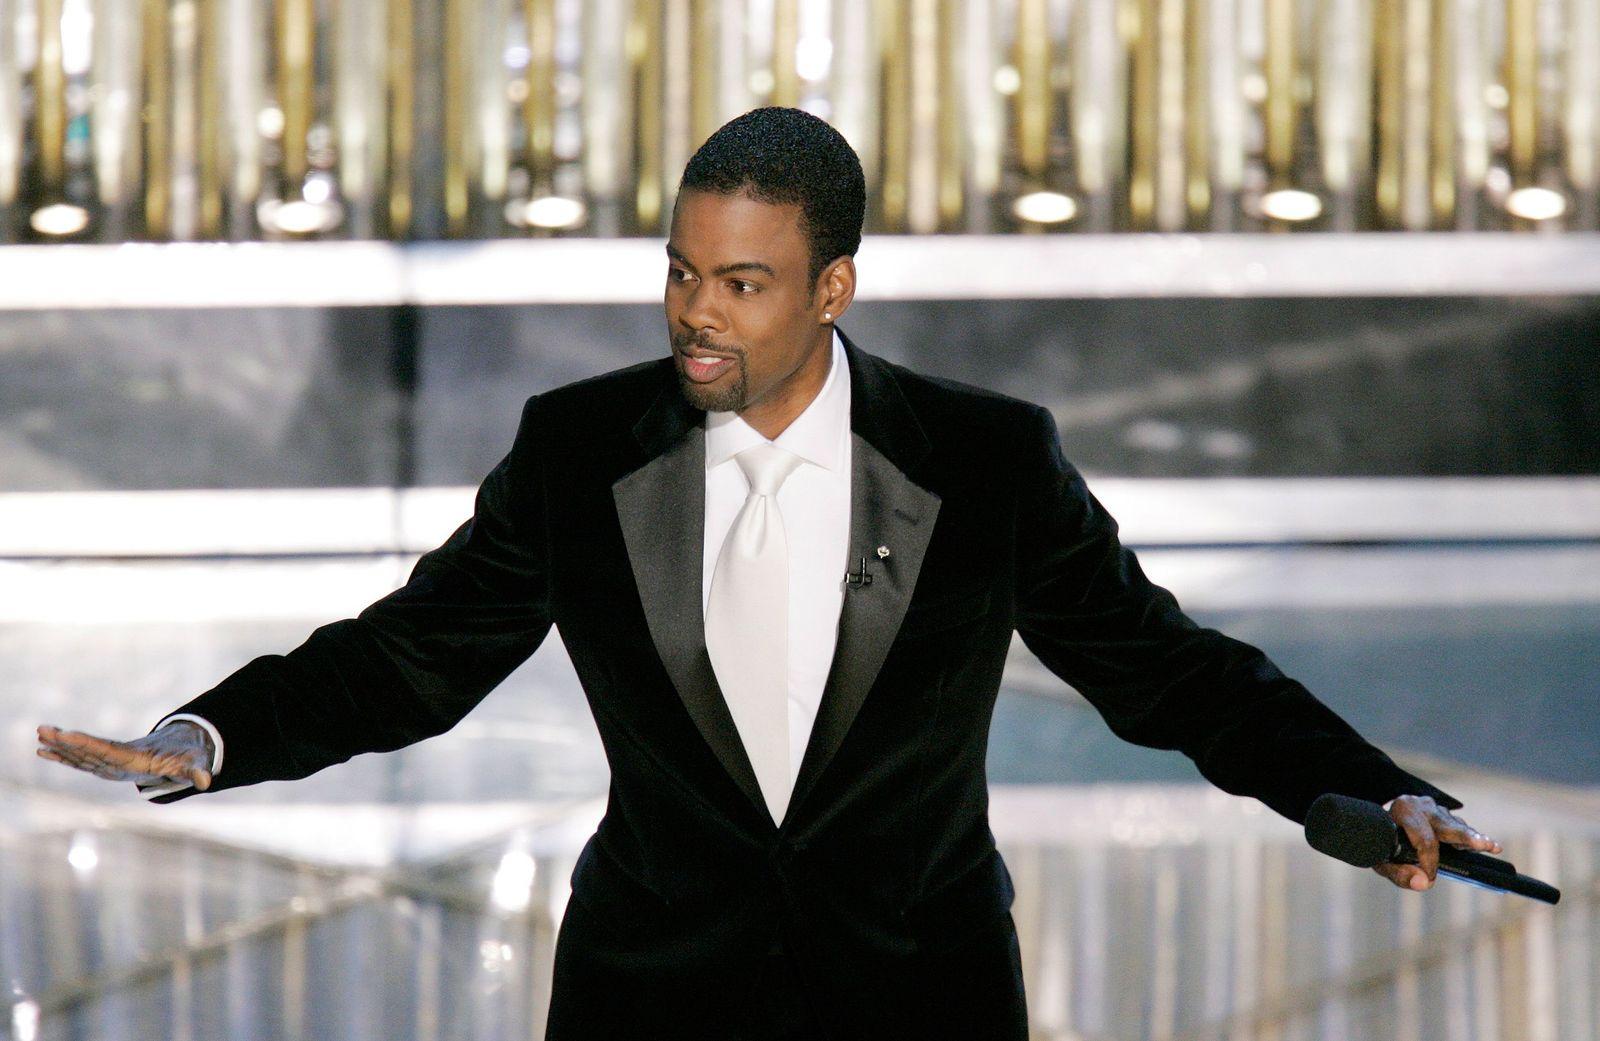 Oscars/ Chris Rock